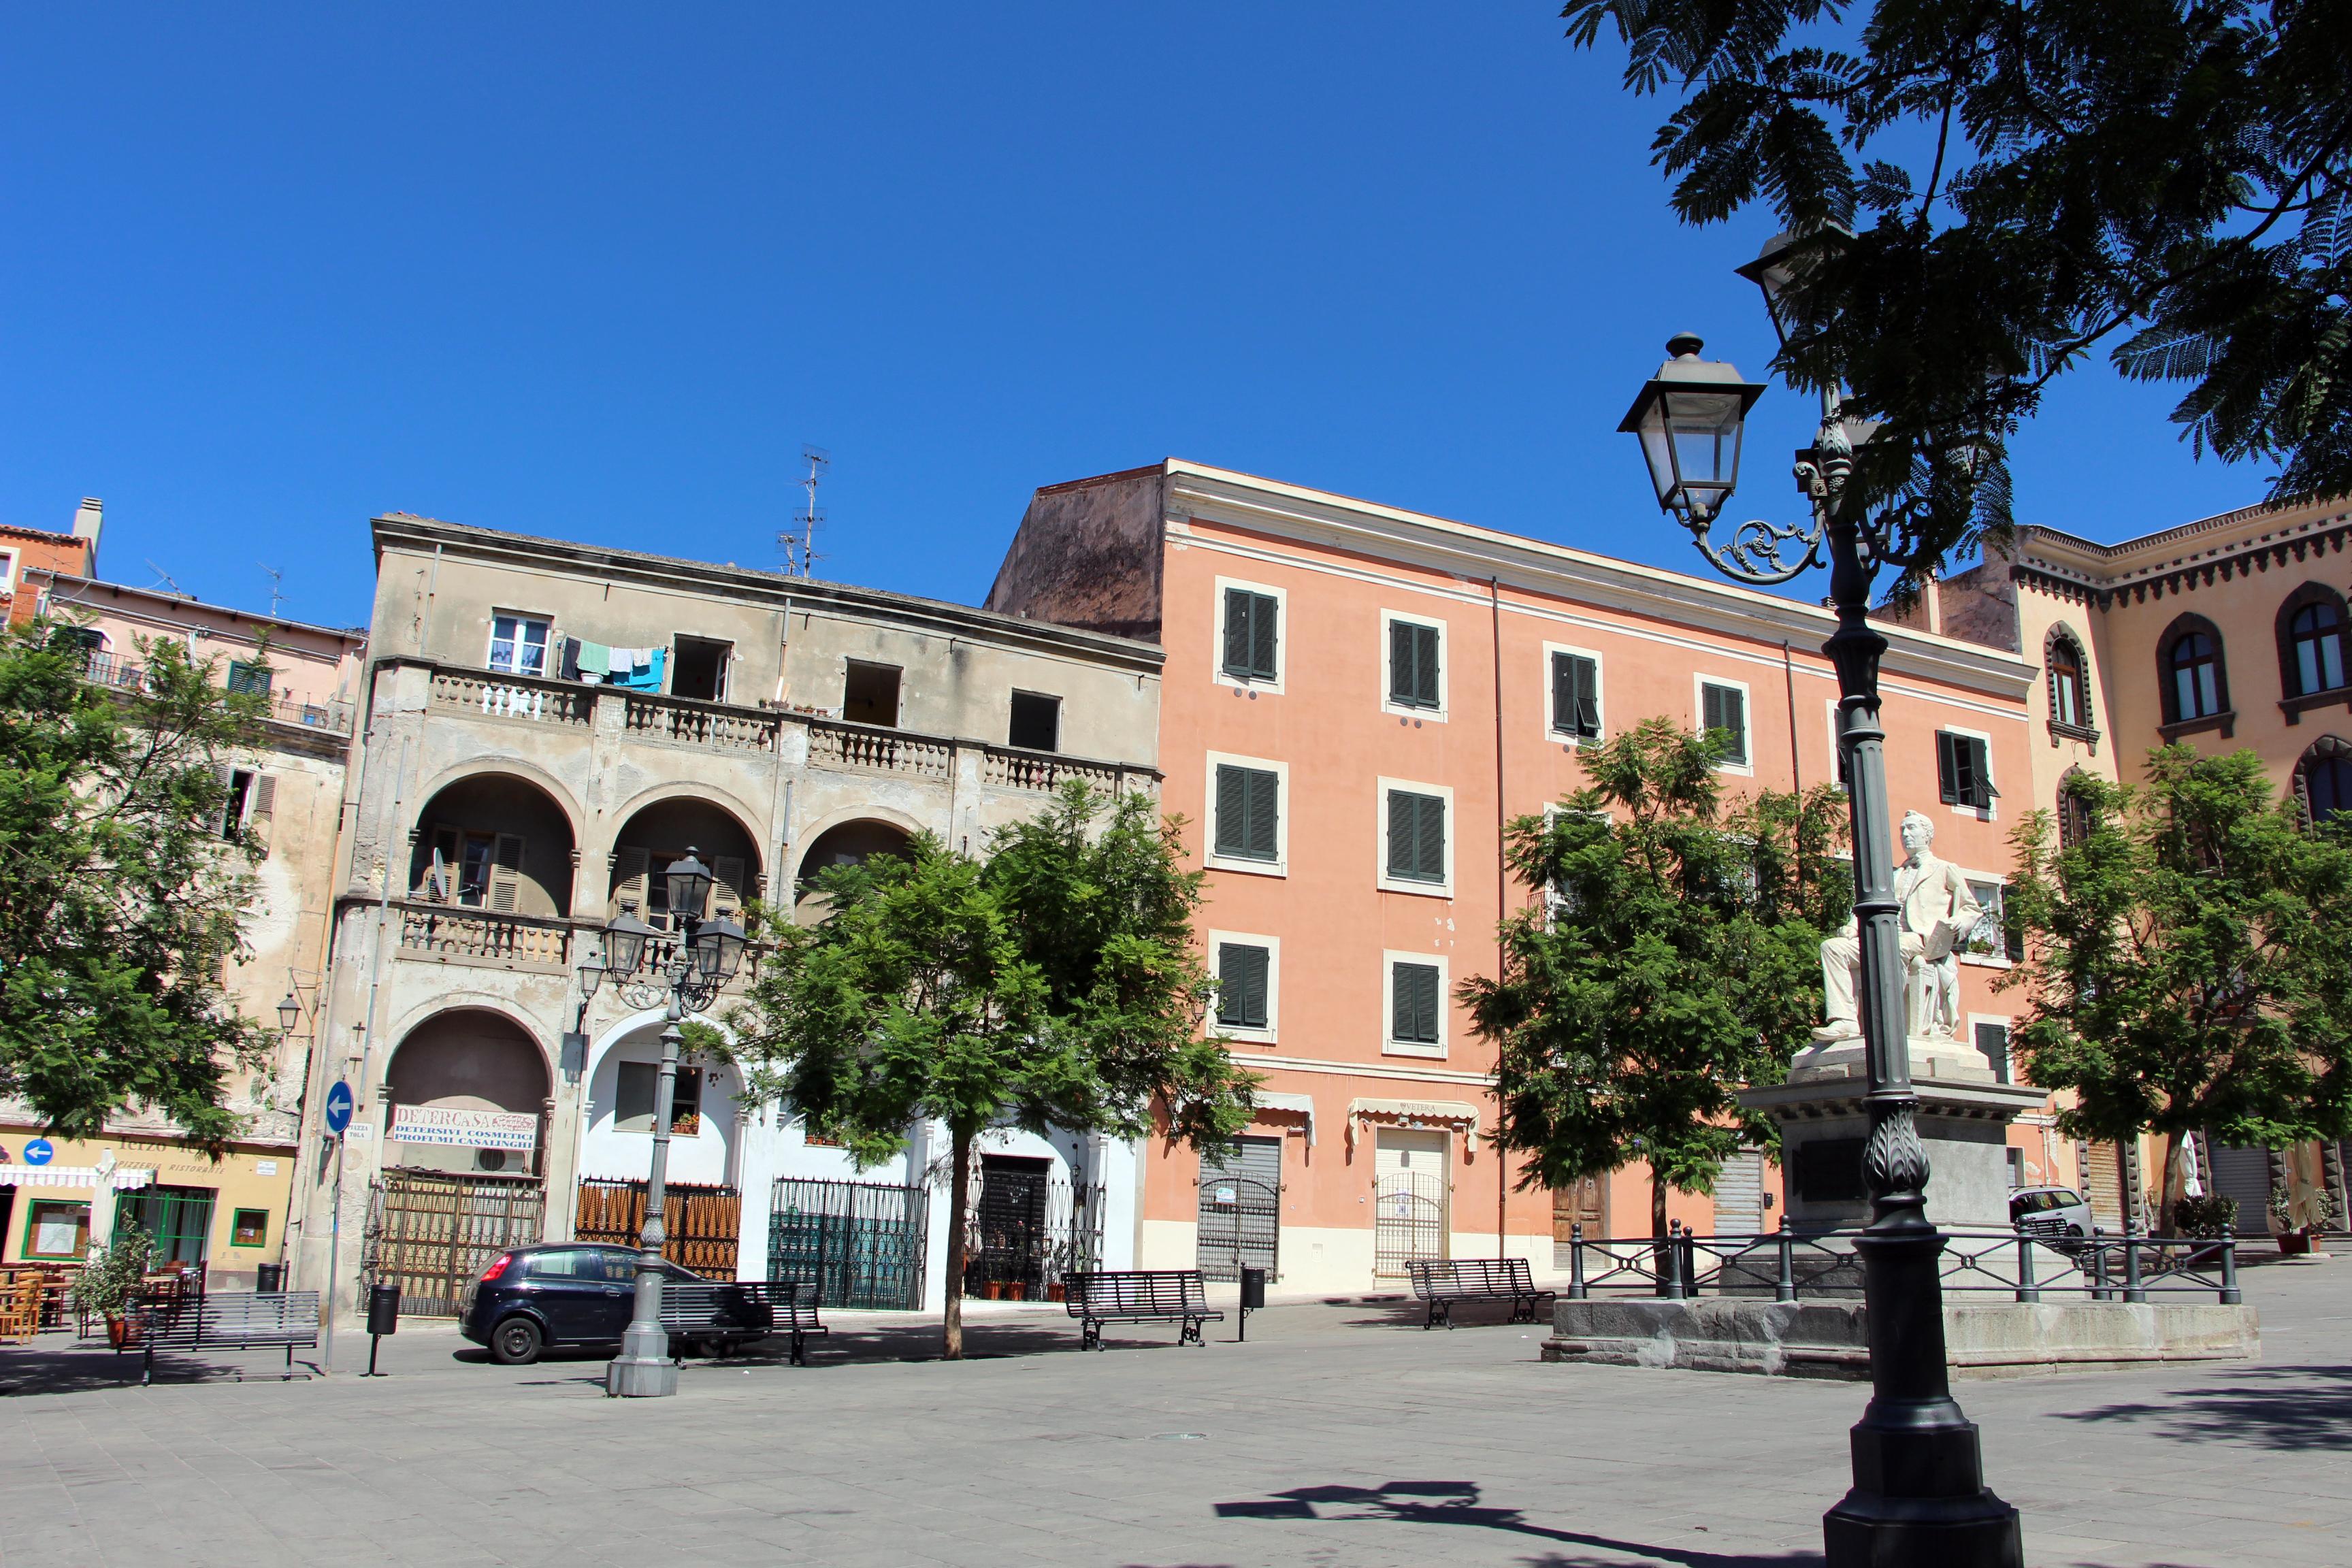 Piazza Tola - Sassari